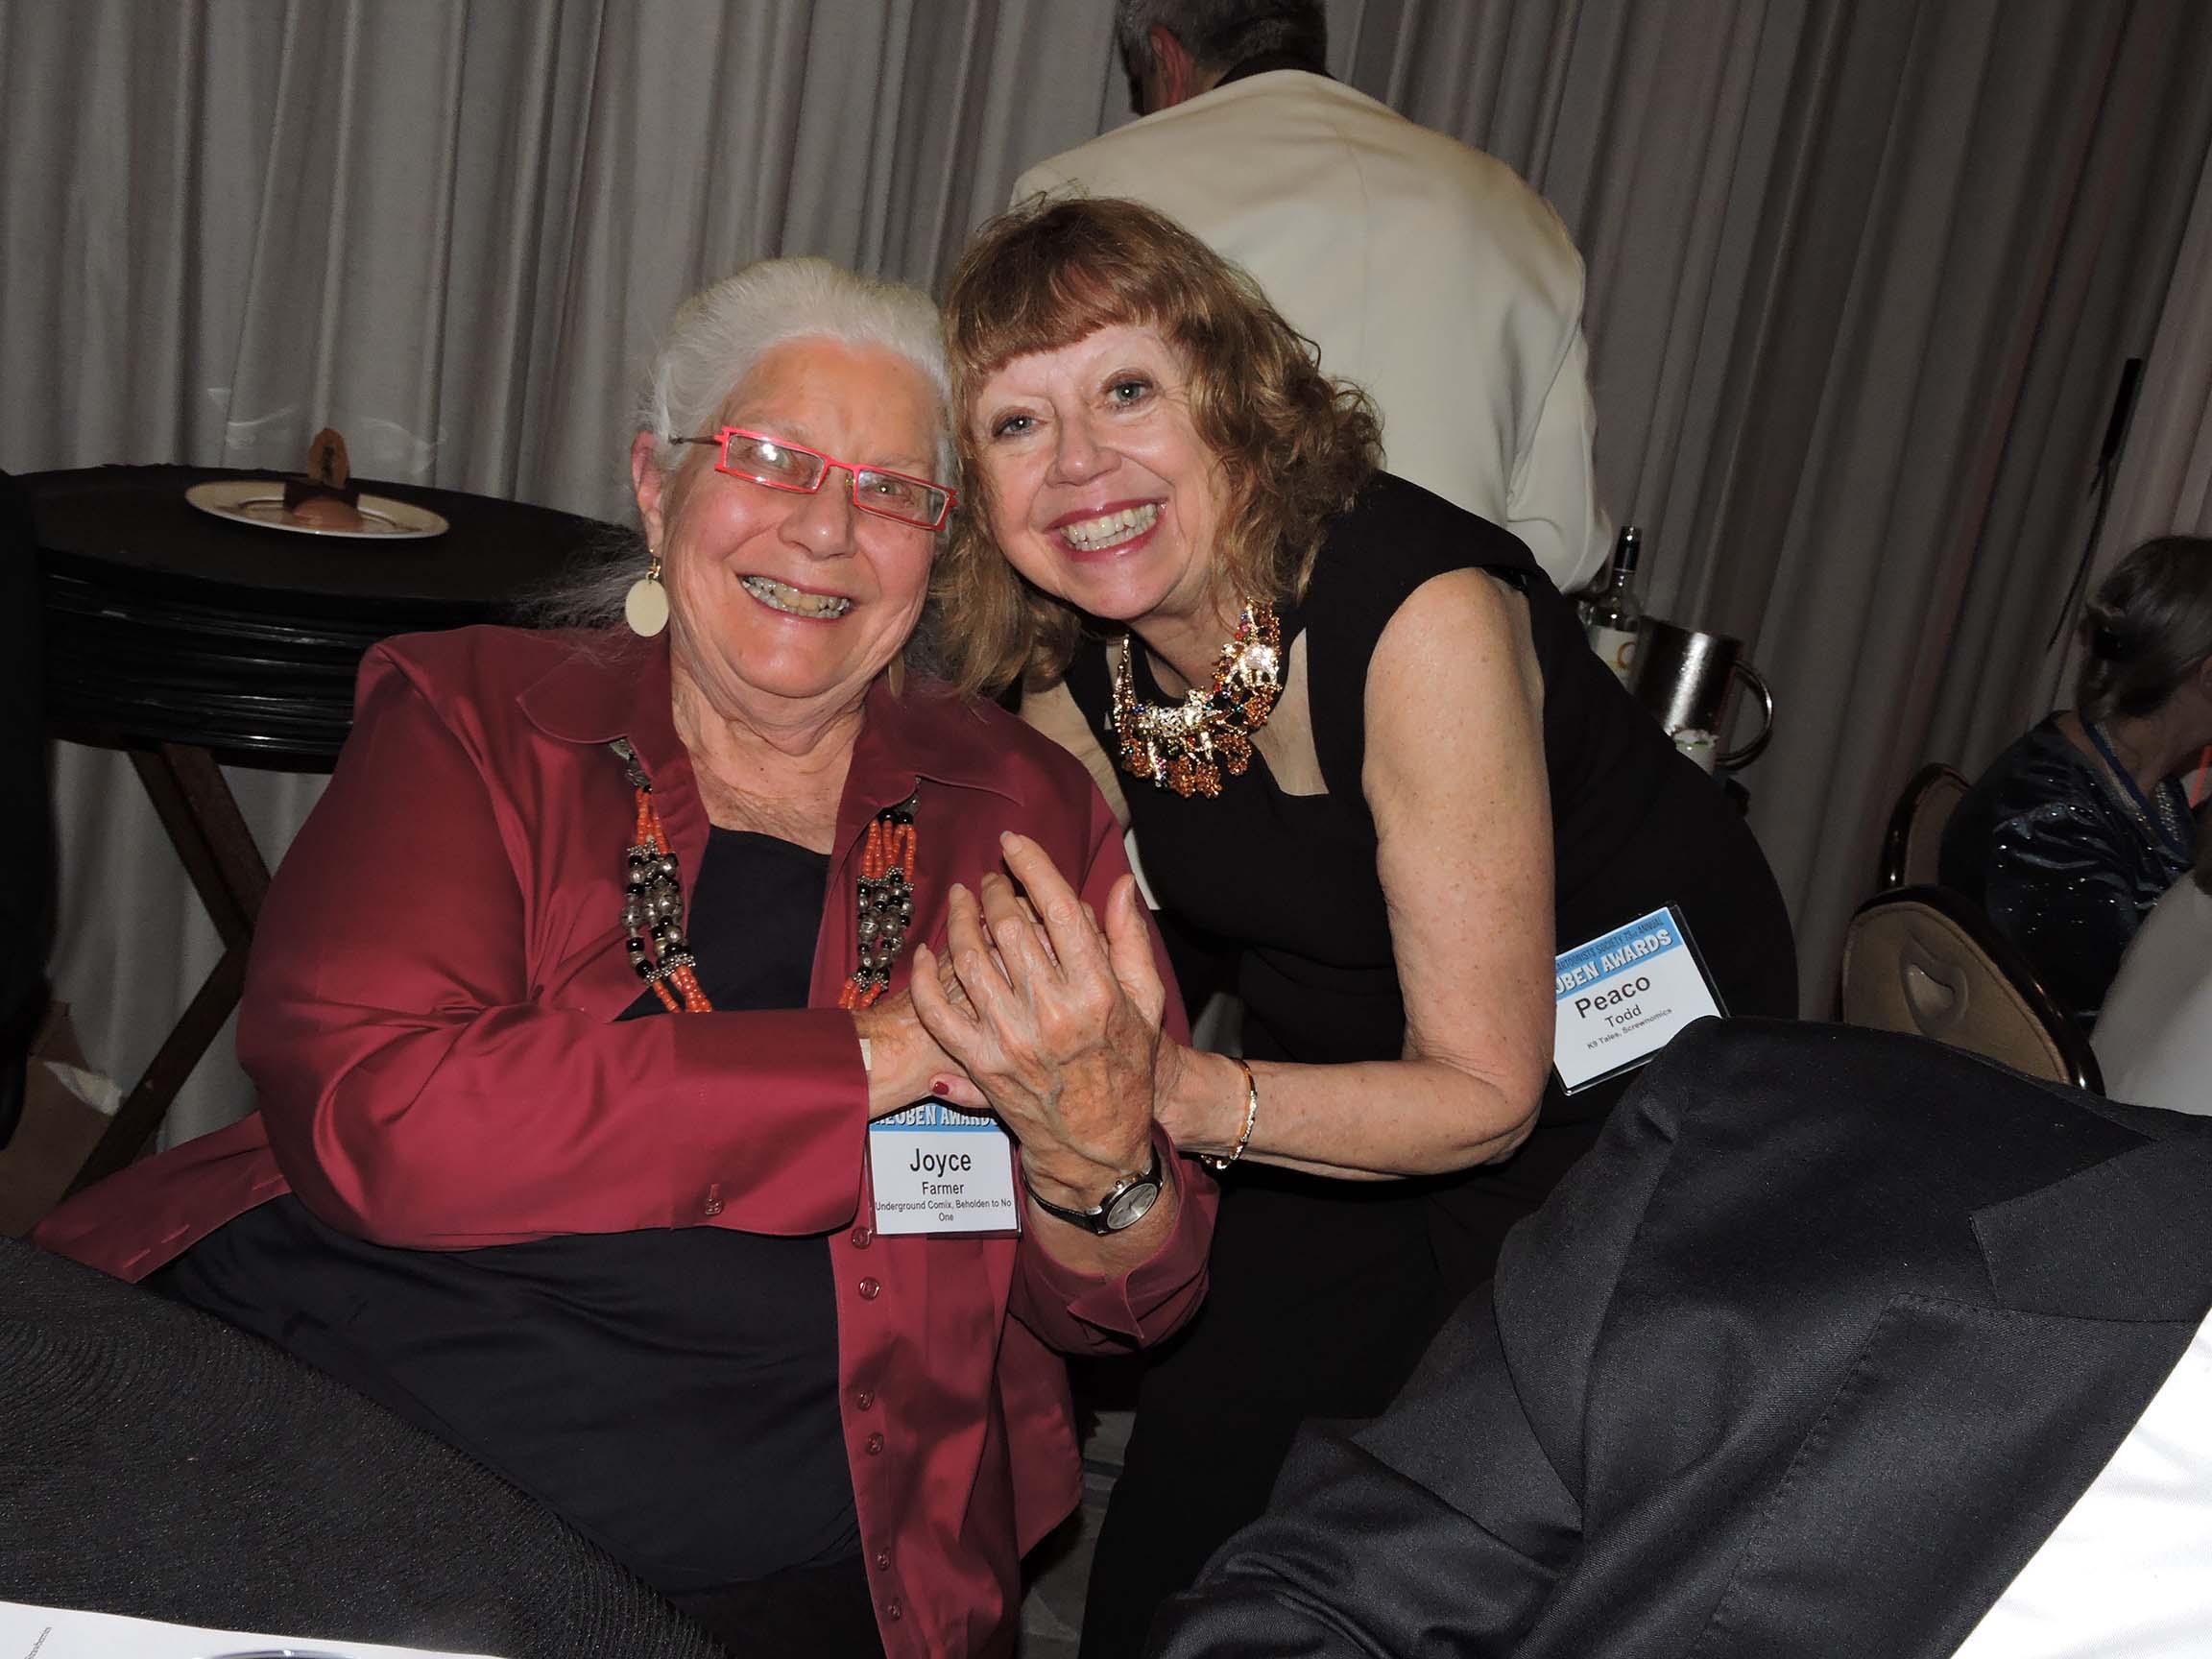 Joyce Farmer (left) and Peaco Todd